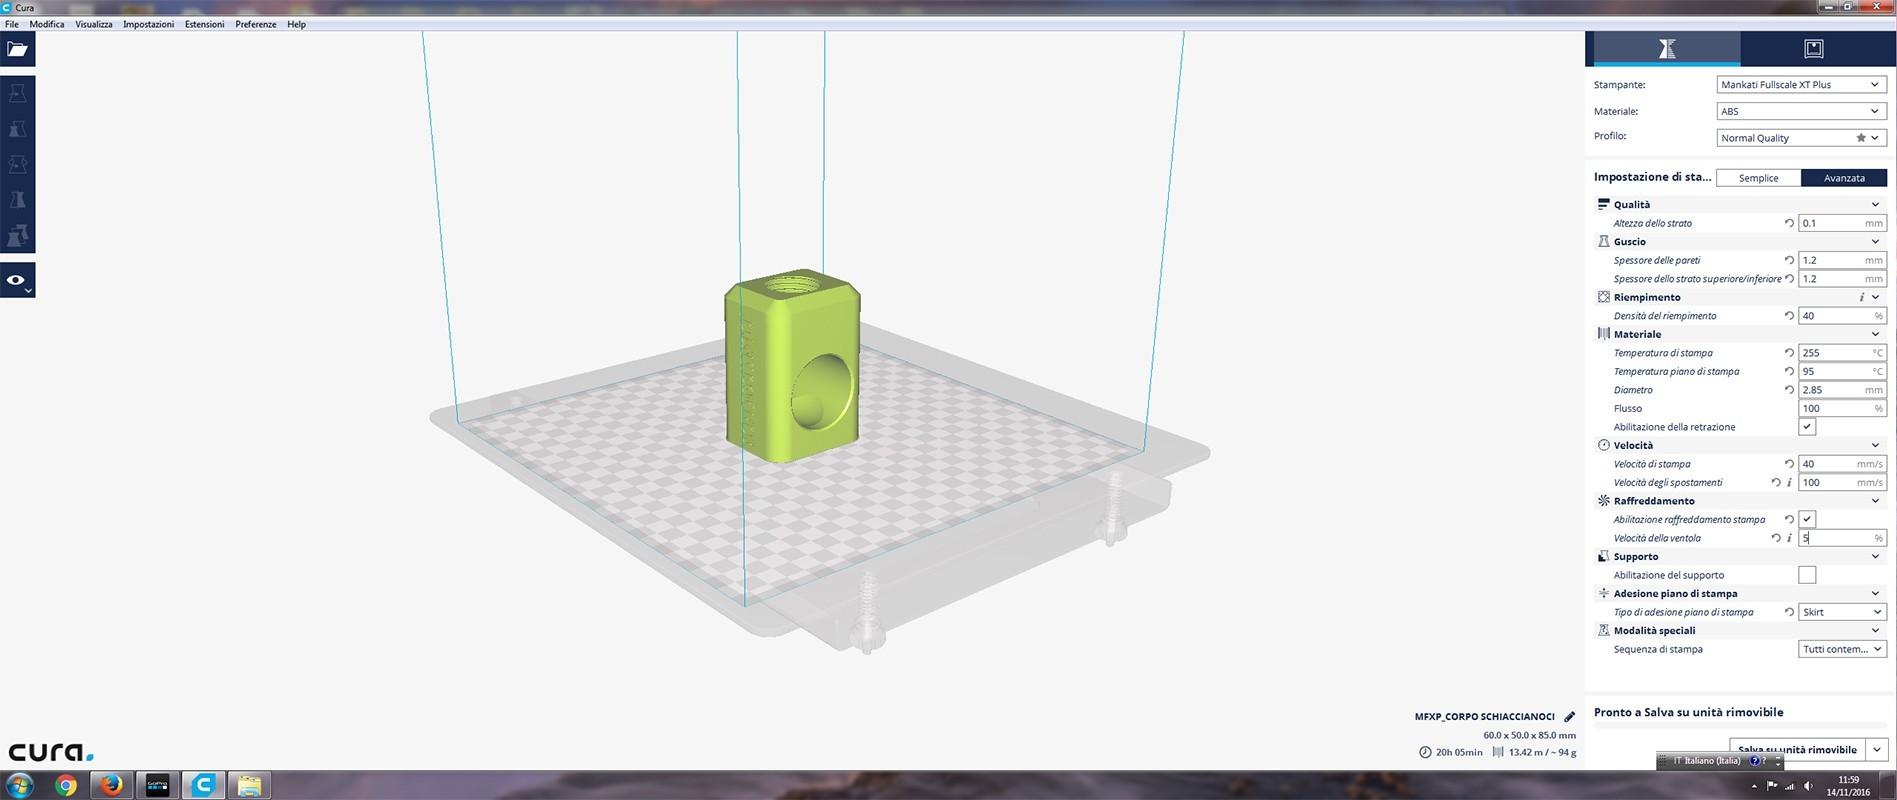 SCREEN-CURA.jpg Télécharger fichier STL gratuit CASSE NOISETTE • Plan imprimable en 3D, bersandro